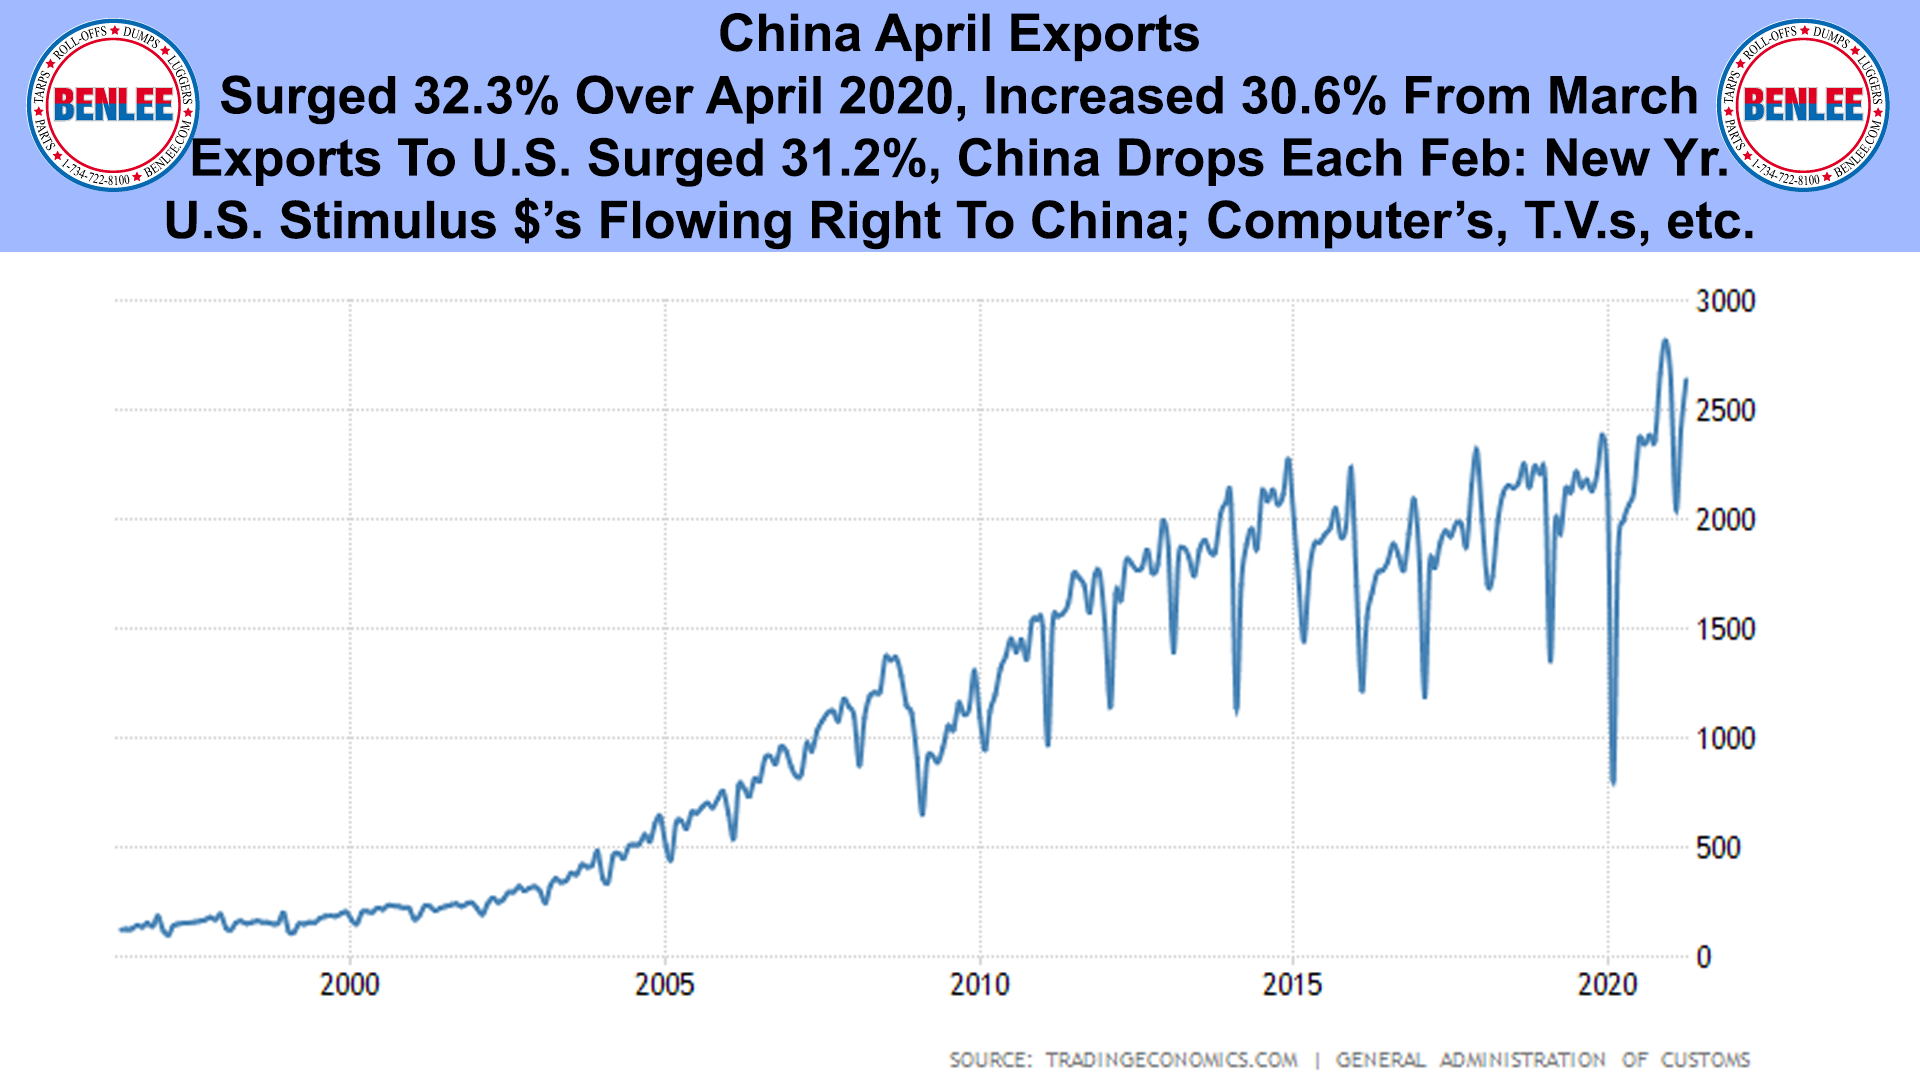 China April Exports